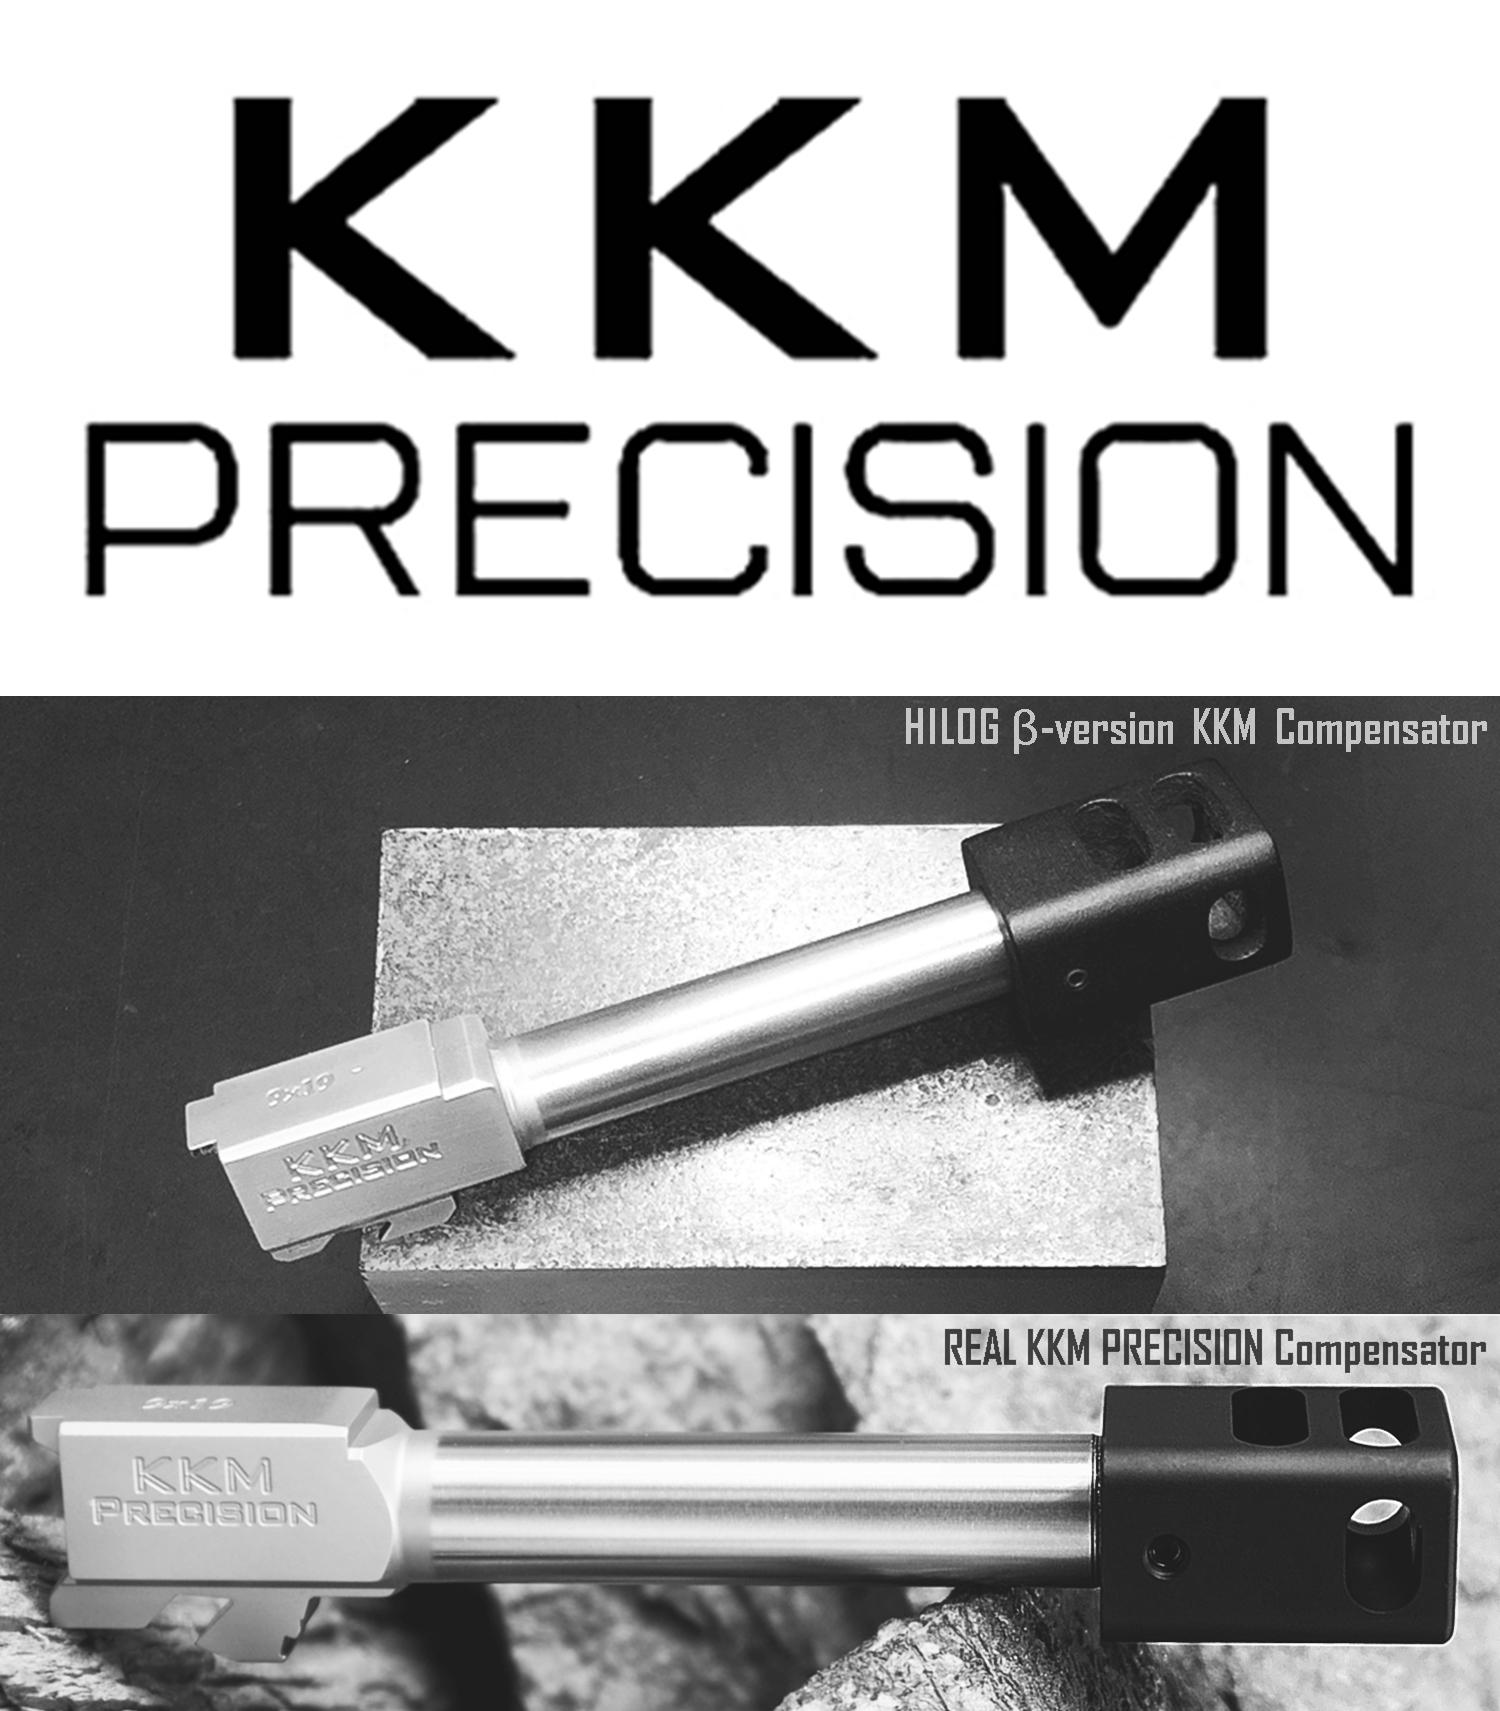 17 KKM MATCH BARREL + PROTECTOR KJ WORKS G19 TYPE & COMPENSATOR β-VERSION HILOG ORIGINAL 3D MOCKUP!! 『SUPDEFG19』自力で作るぞ大作戦!! 最も重要なアウターバレル&コンペンセイターの準備は整った!! DIY サ